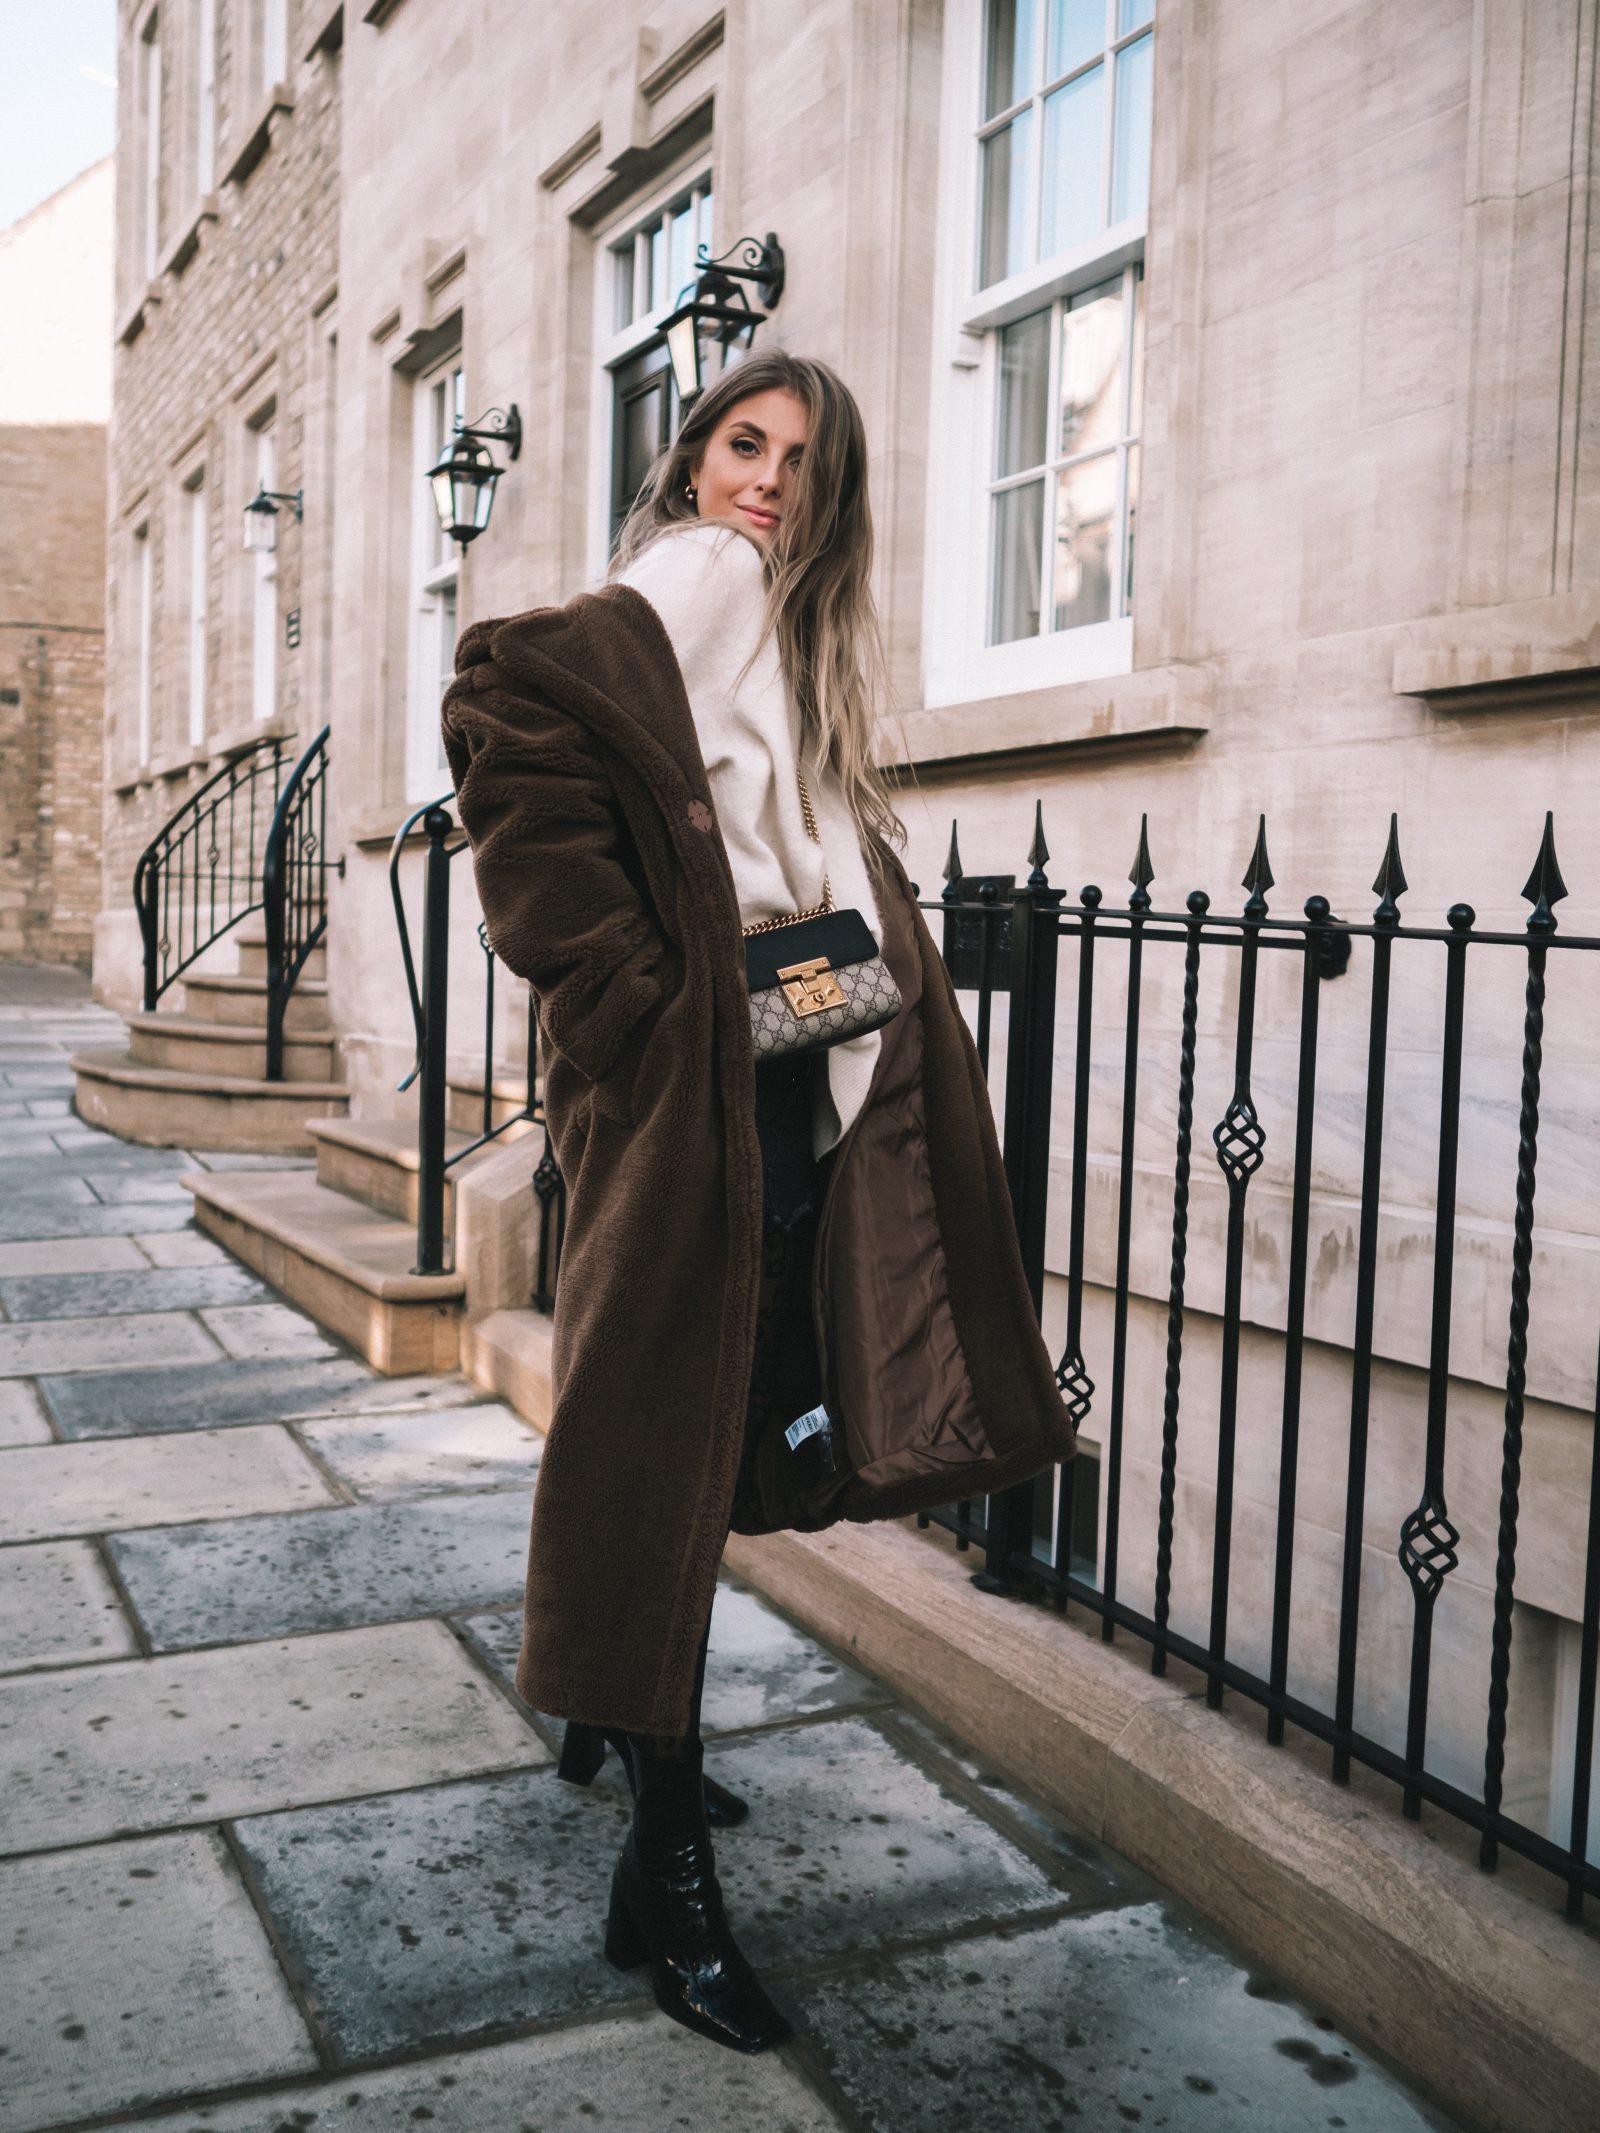 Warmest Coat - Maxi Fur Coat - Sinead Crowe Autumn Street Style